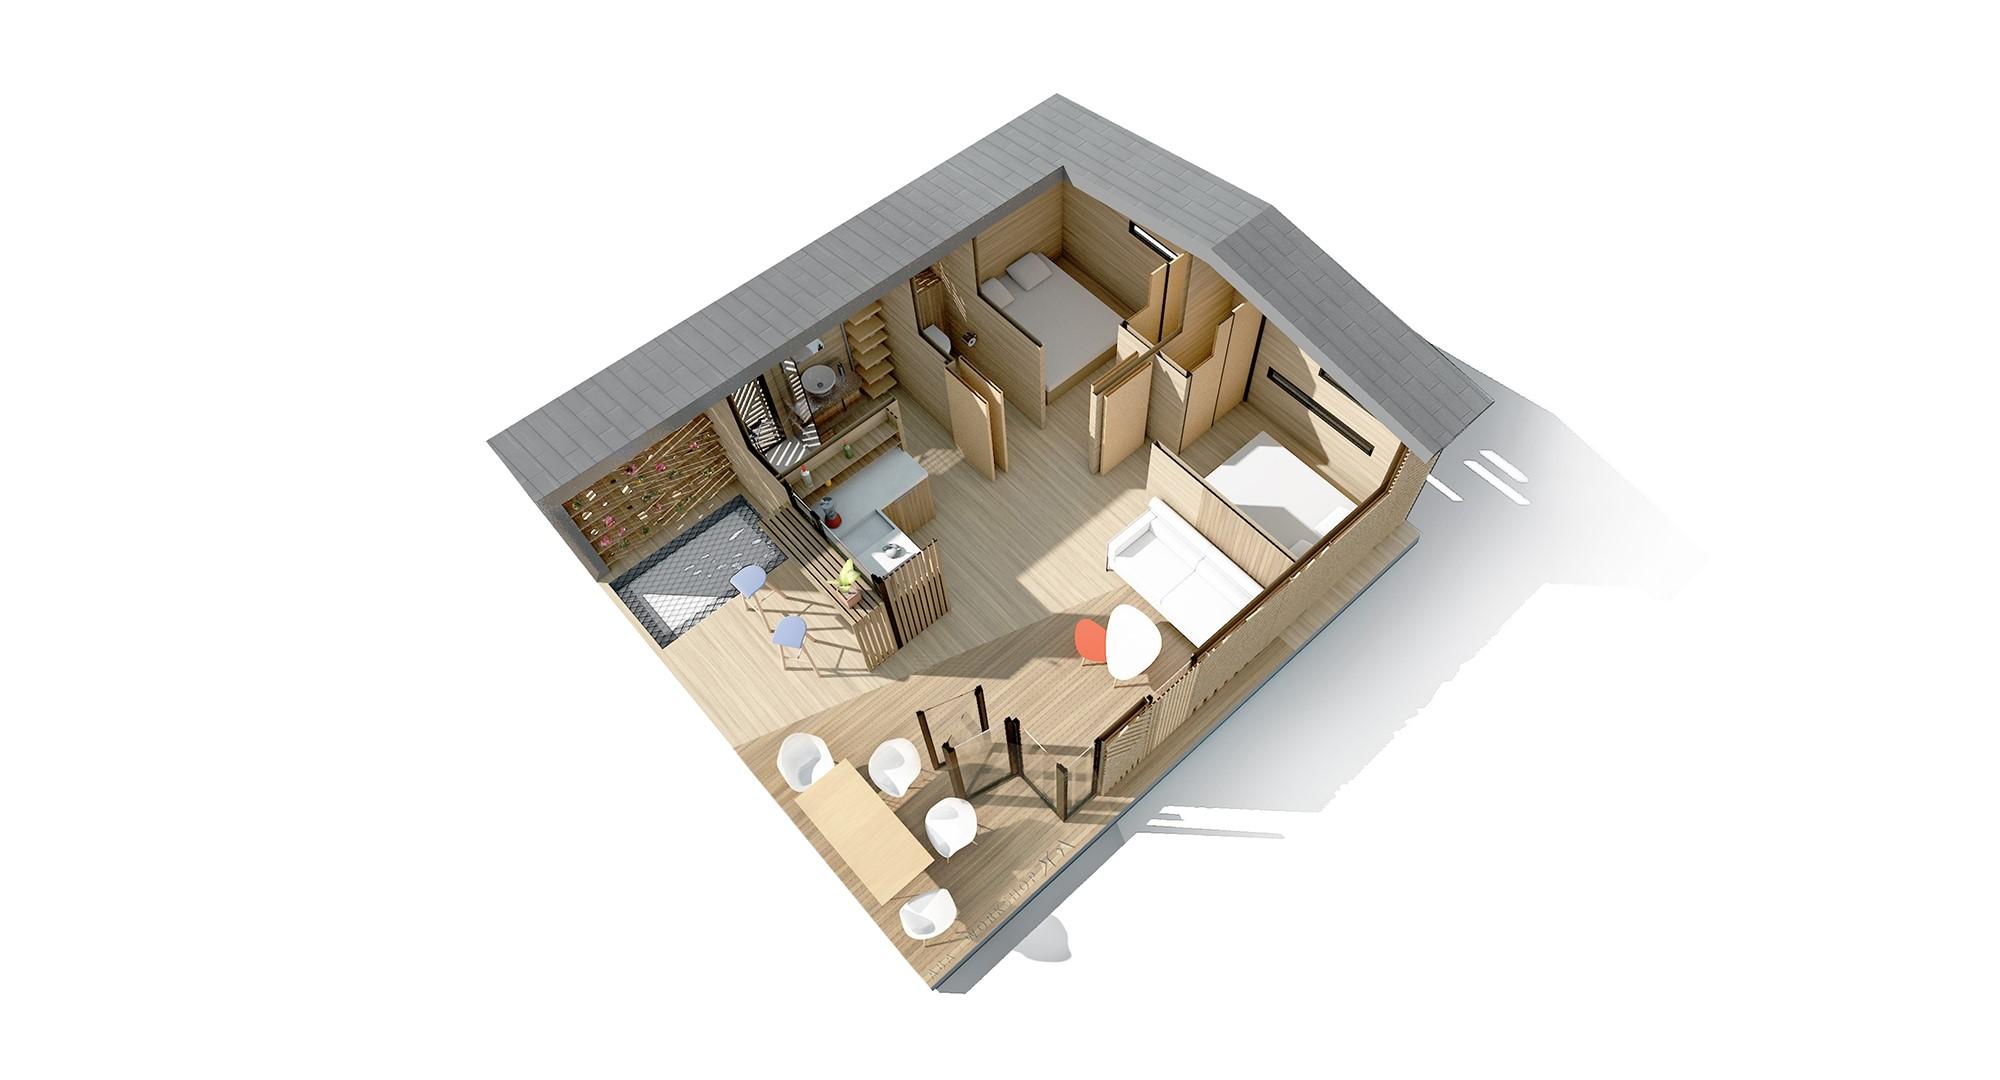 mon chalet d architecte c30 aba workshop. Black Bedroom Furniture Sets. Home Design Ideas